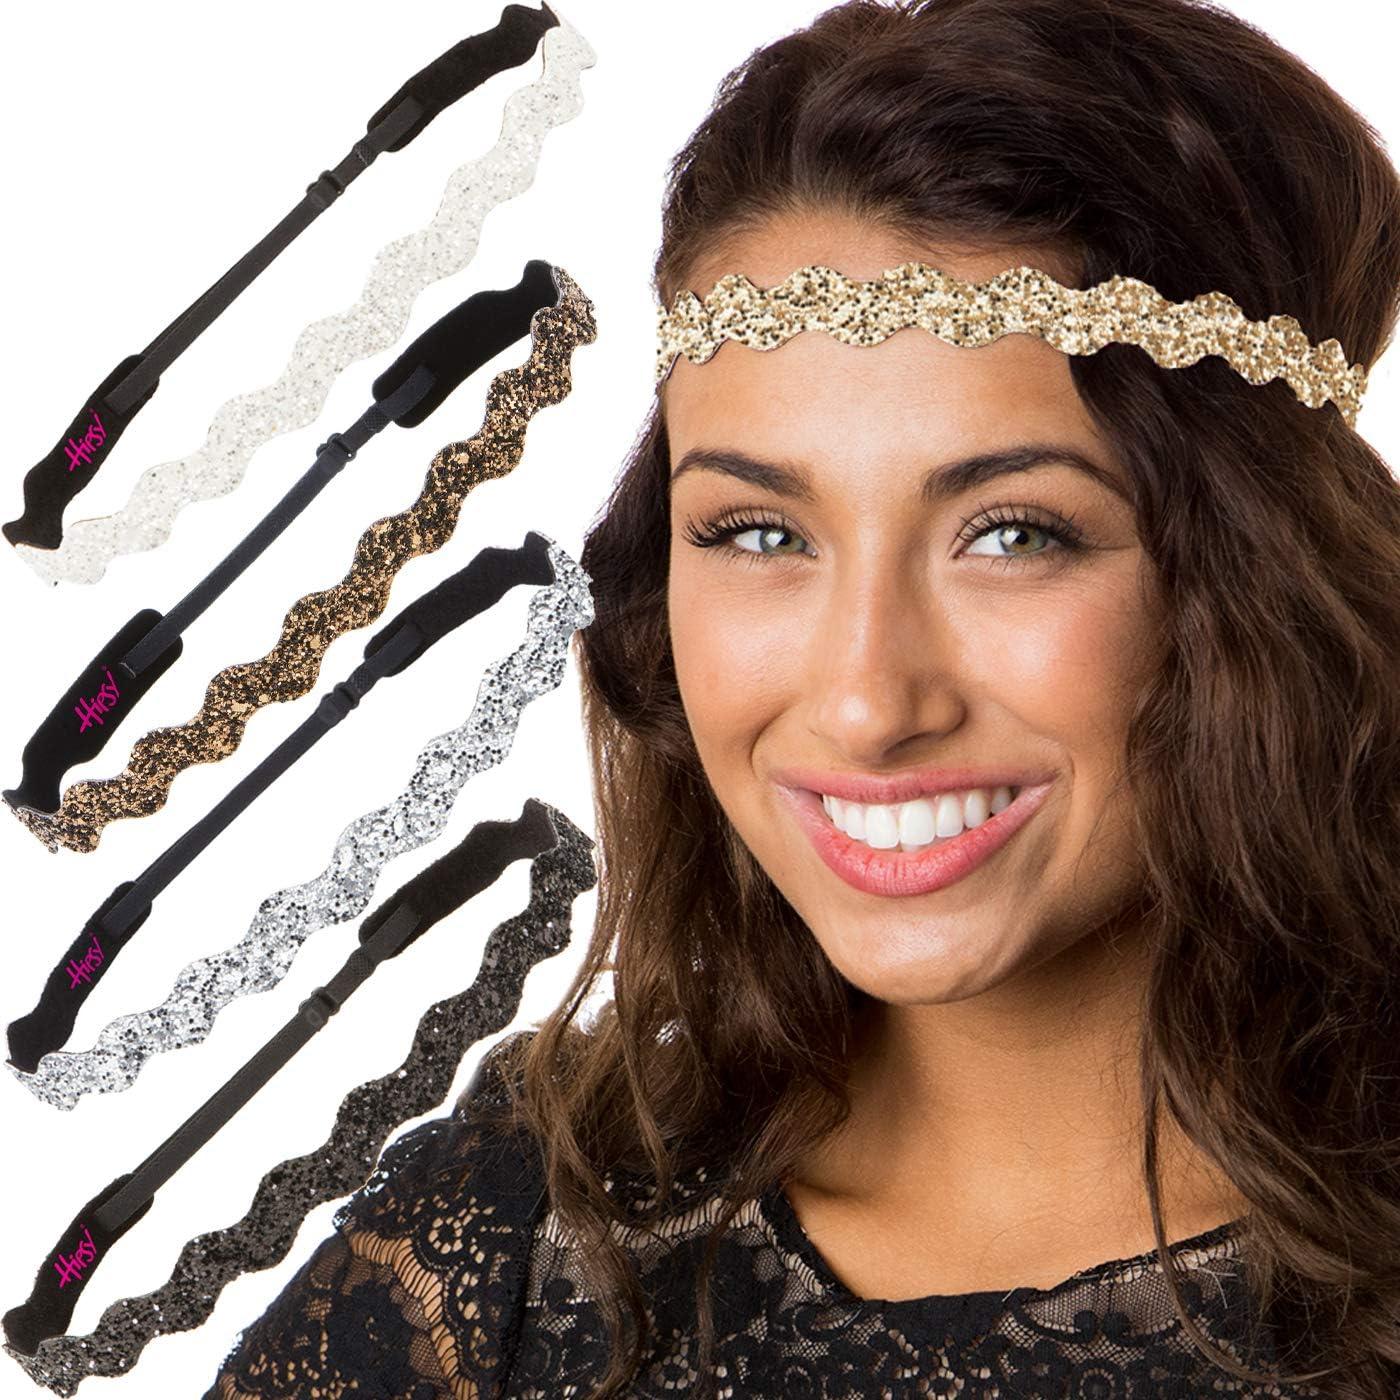 Hipsy Petite Size, Adjustable No Slip Sparkly Bling Glitter Wave 5pk Headbands for Women Girls & Teens